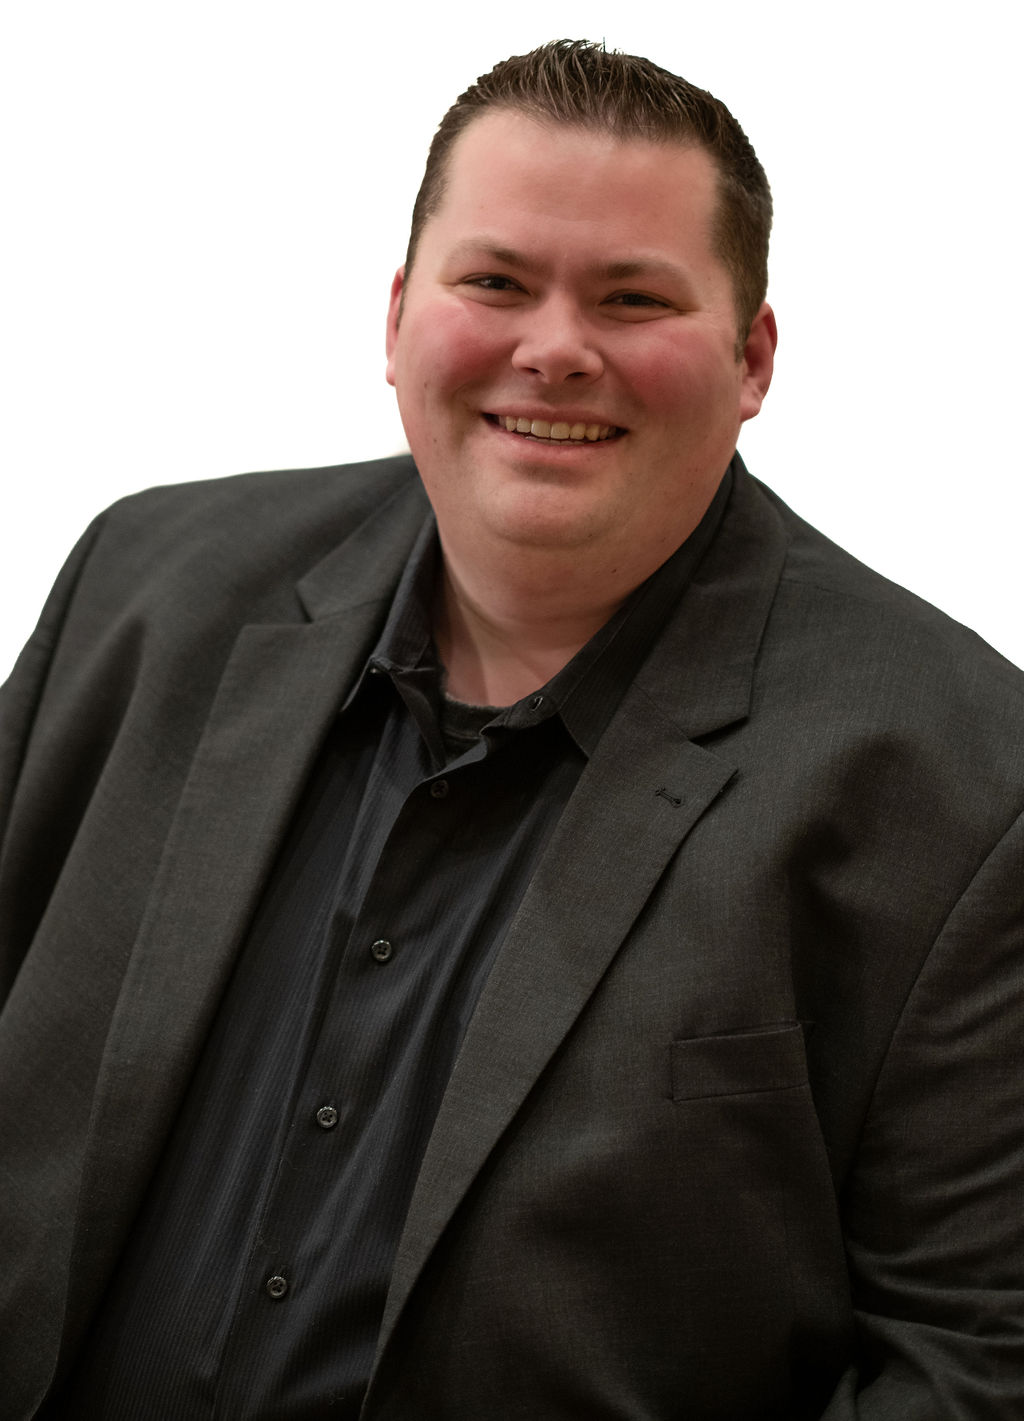 Adam Goodloe